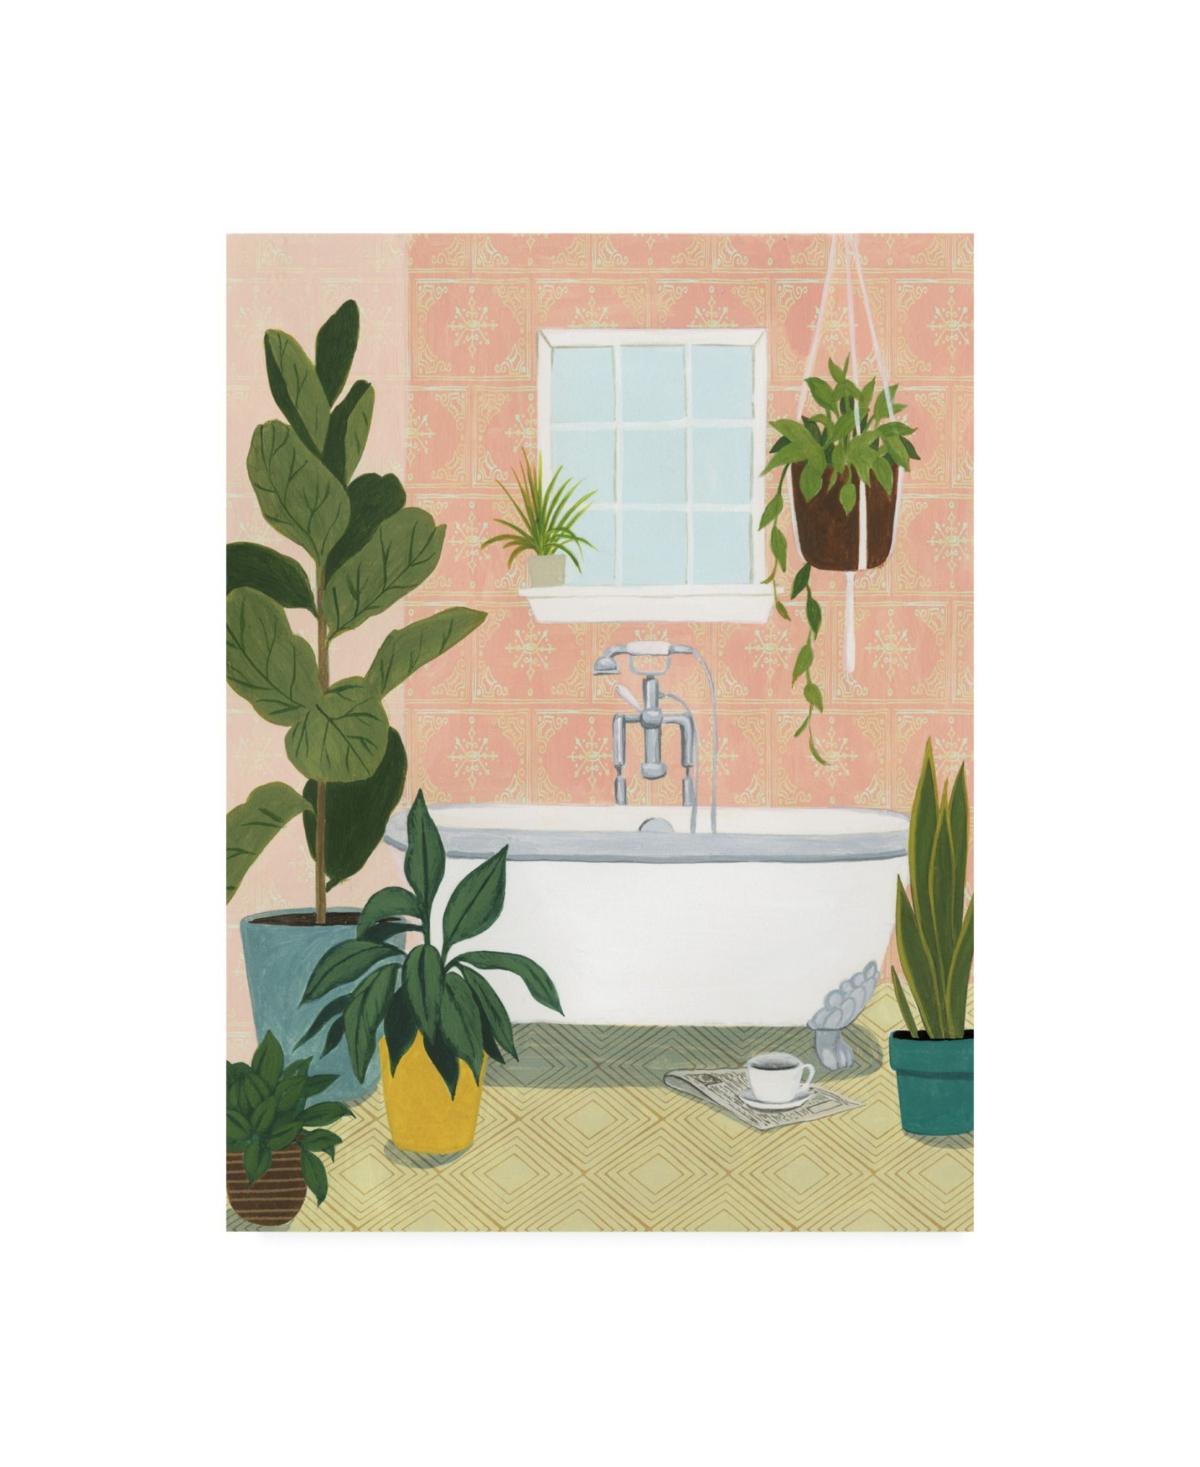 Grace Popp Bathtub Oasis Ii Canvas Art - 15.5